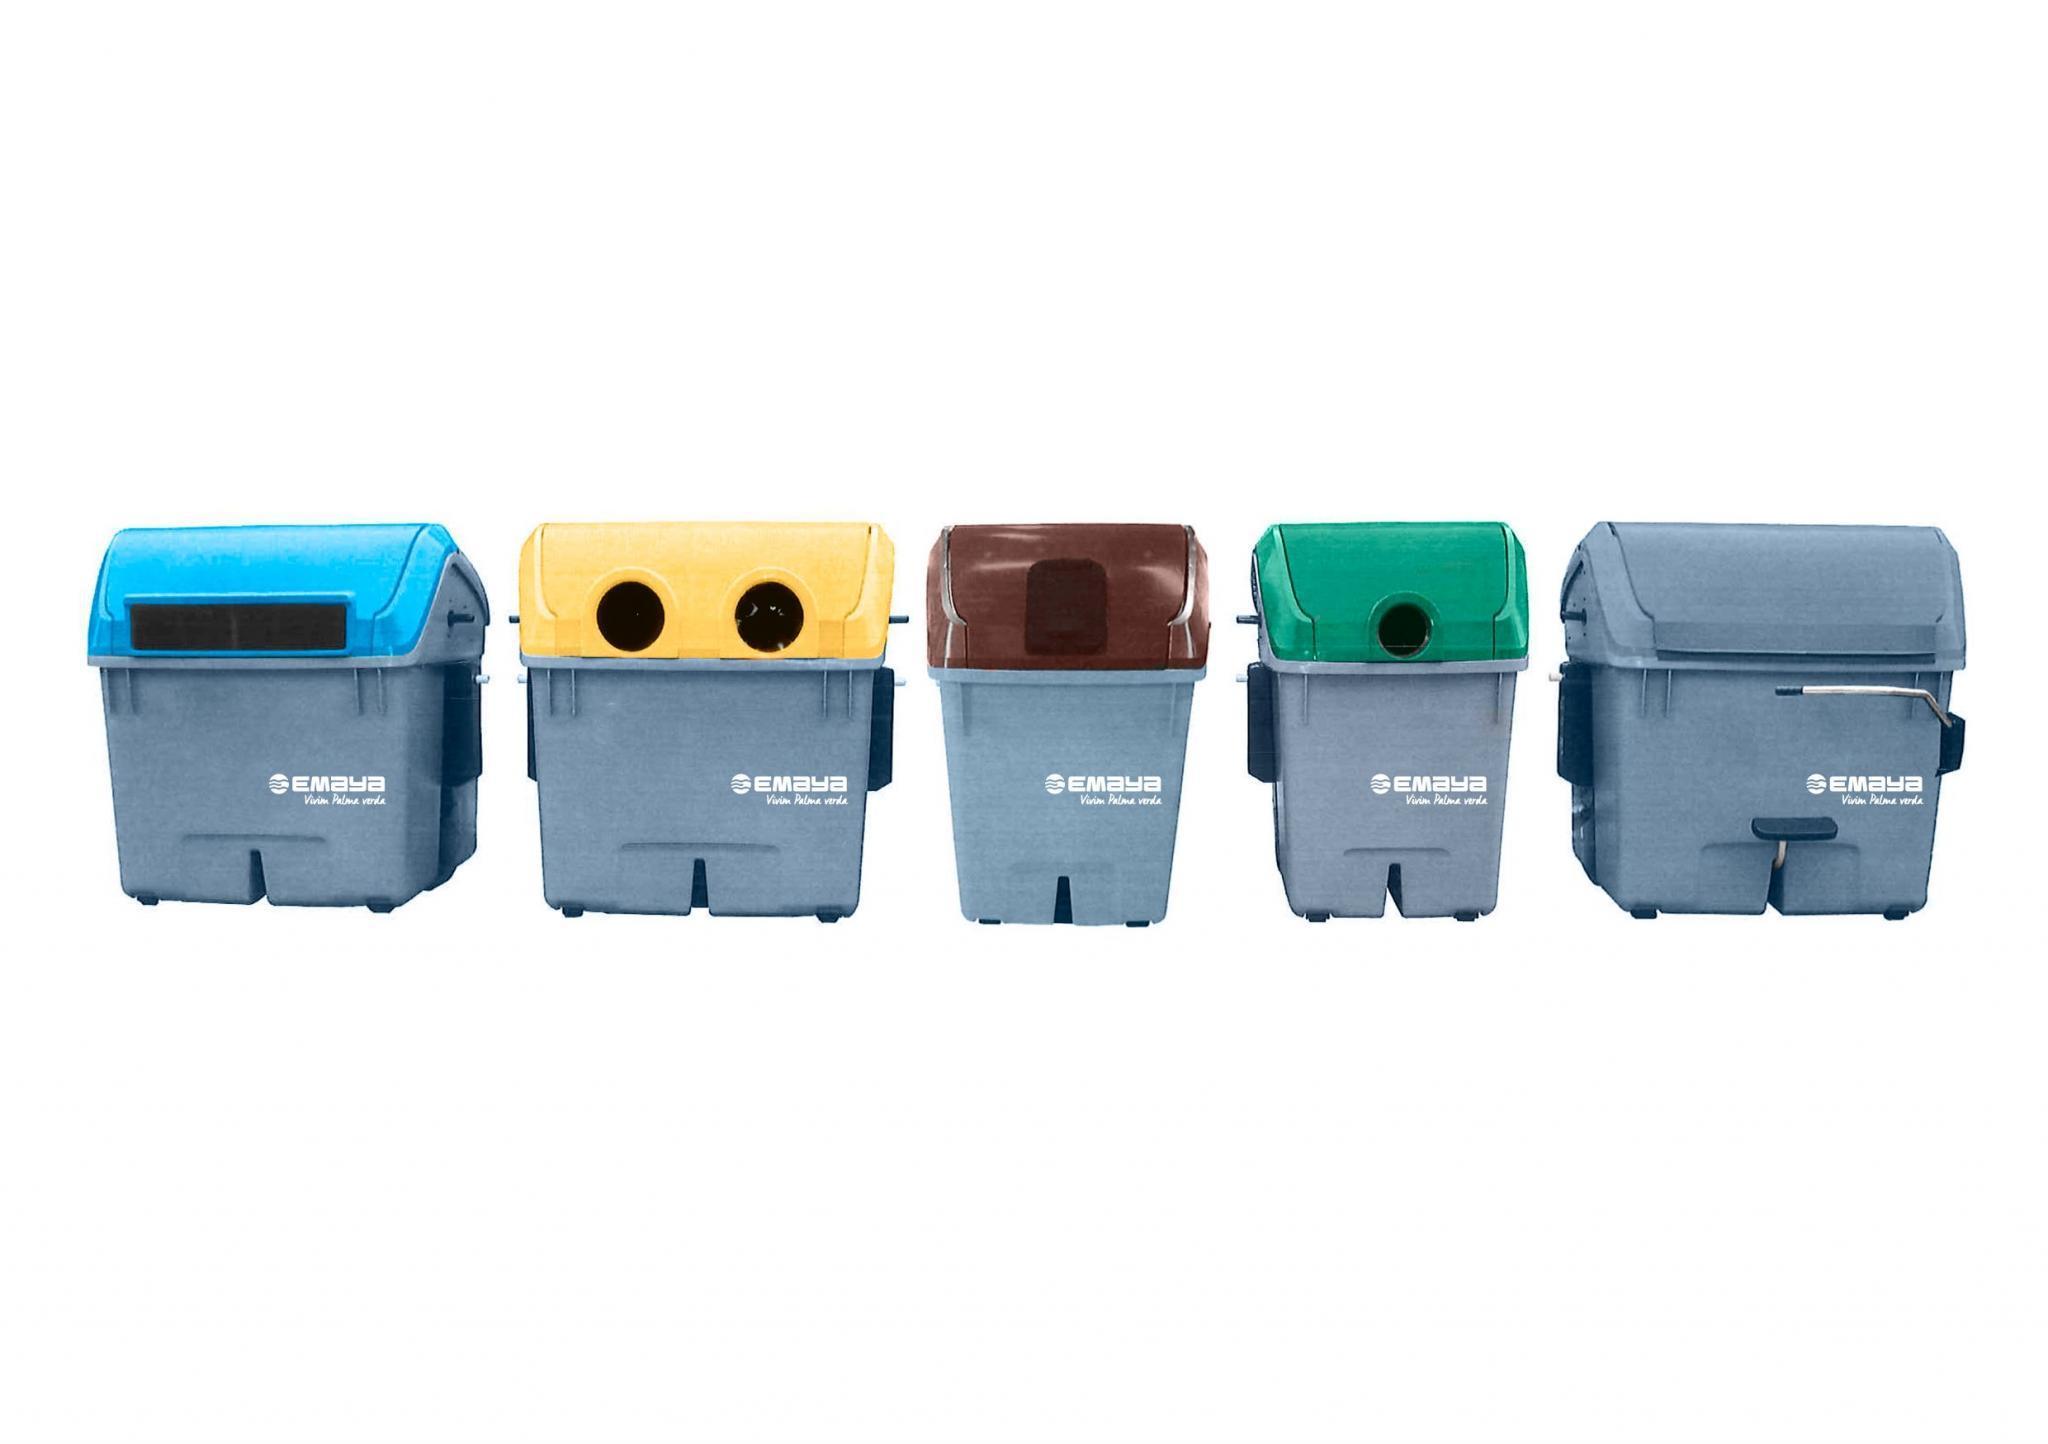 Full Size of Palma Bekommt Ab Ostern Neues Mllsystem Müllsystem Küche Wohnzimmer Müllsystem